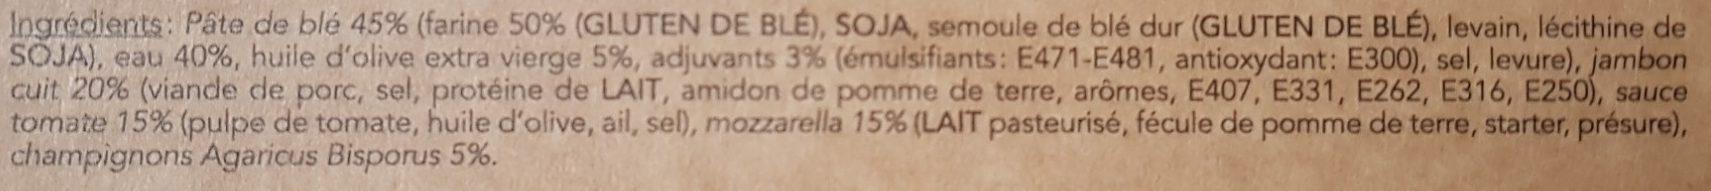 Pizza regina - Ingredients